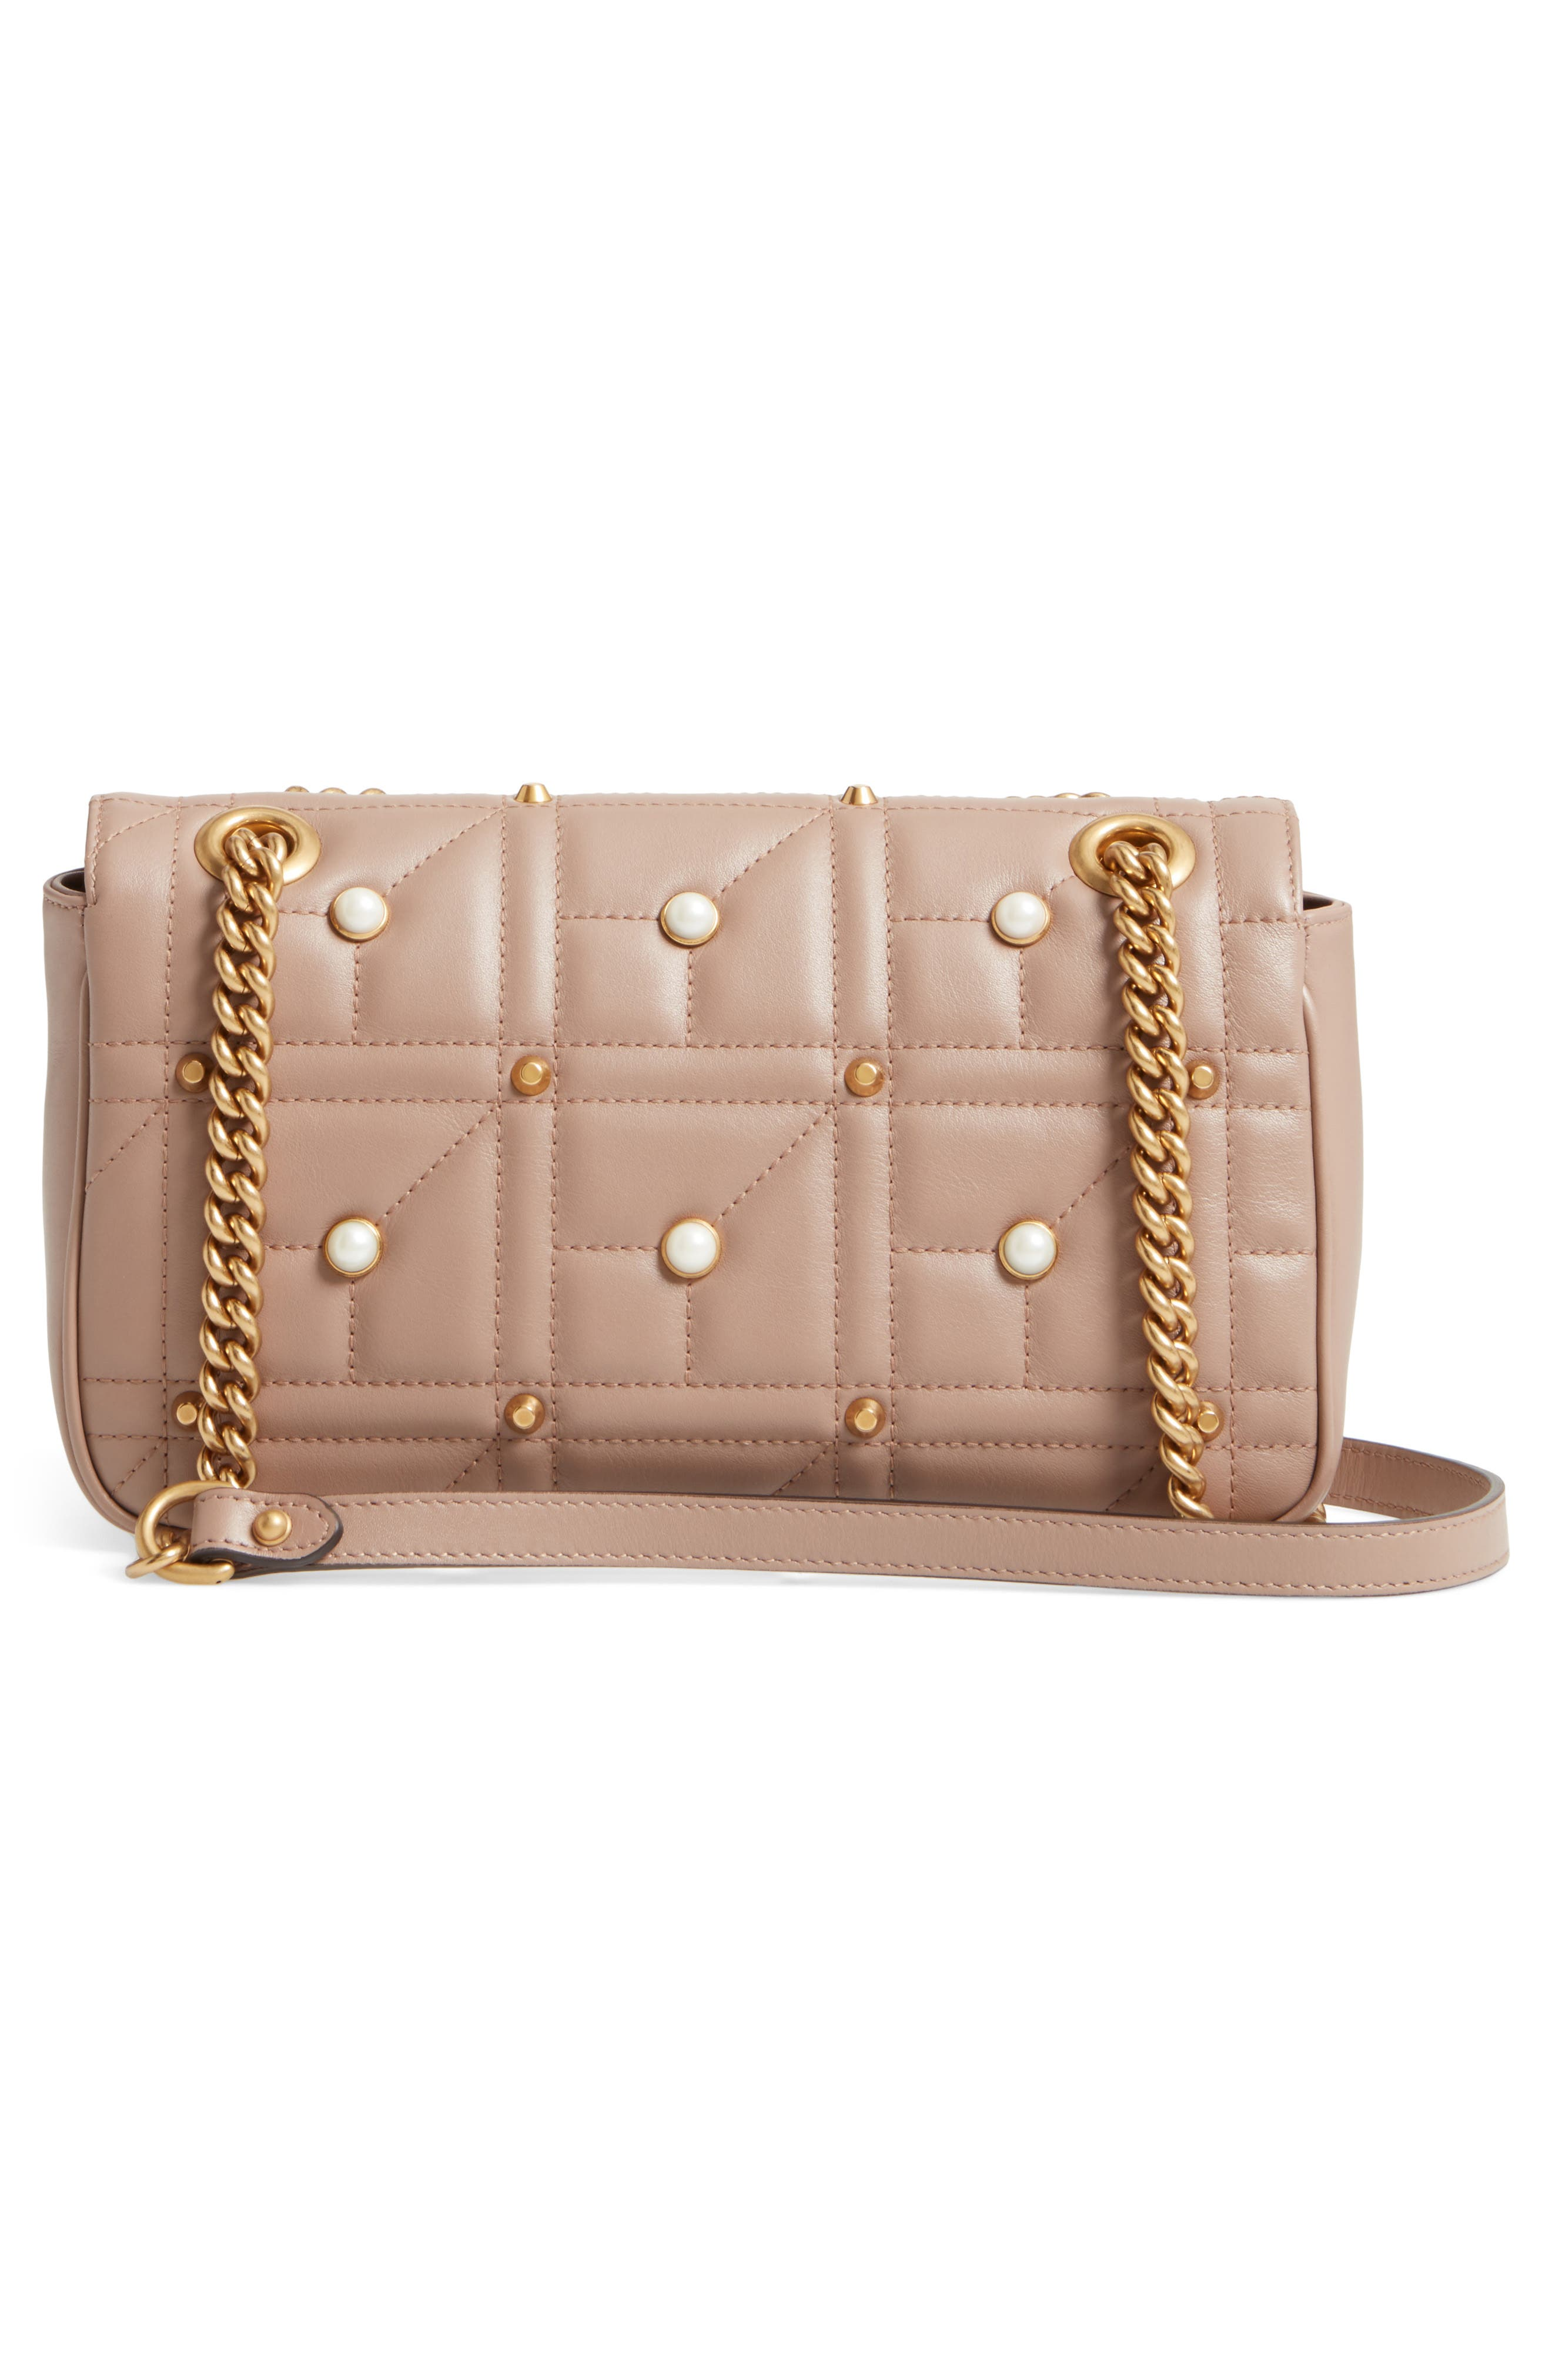 GG Marmont Matelassé Imitation Pearl Leather Shoulder Bag,                             Alternate thumbnail 2, color,                             White/ Pink